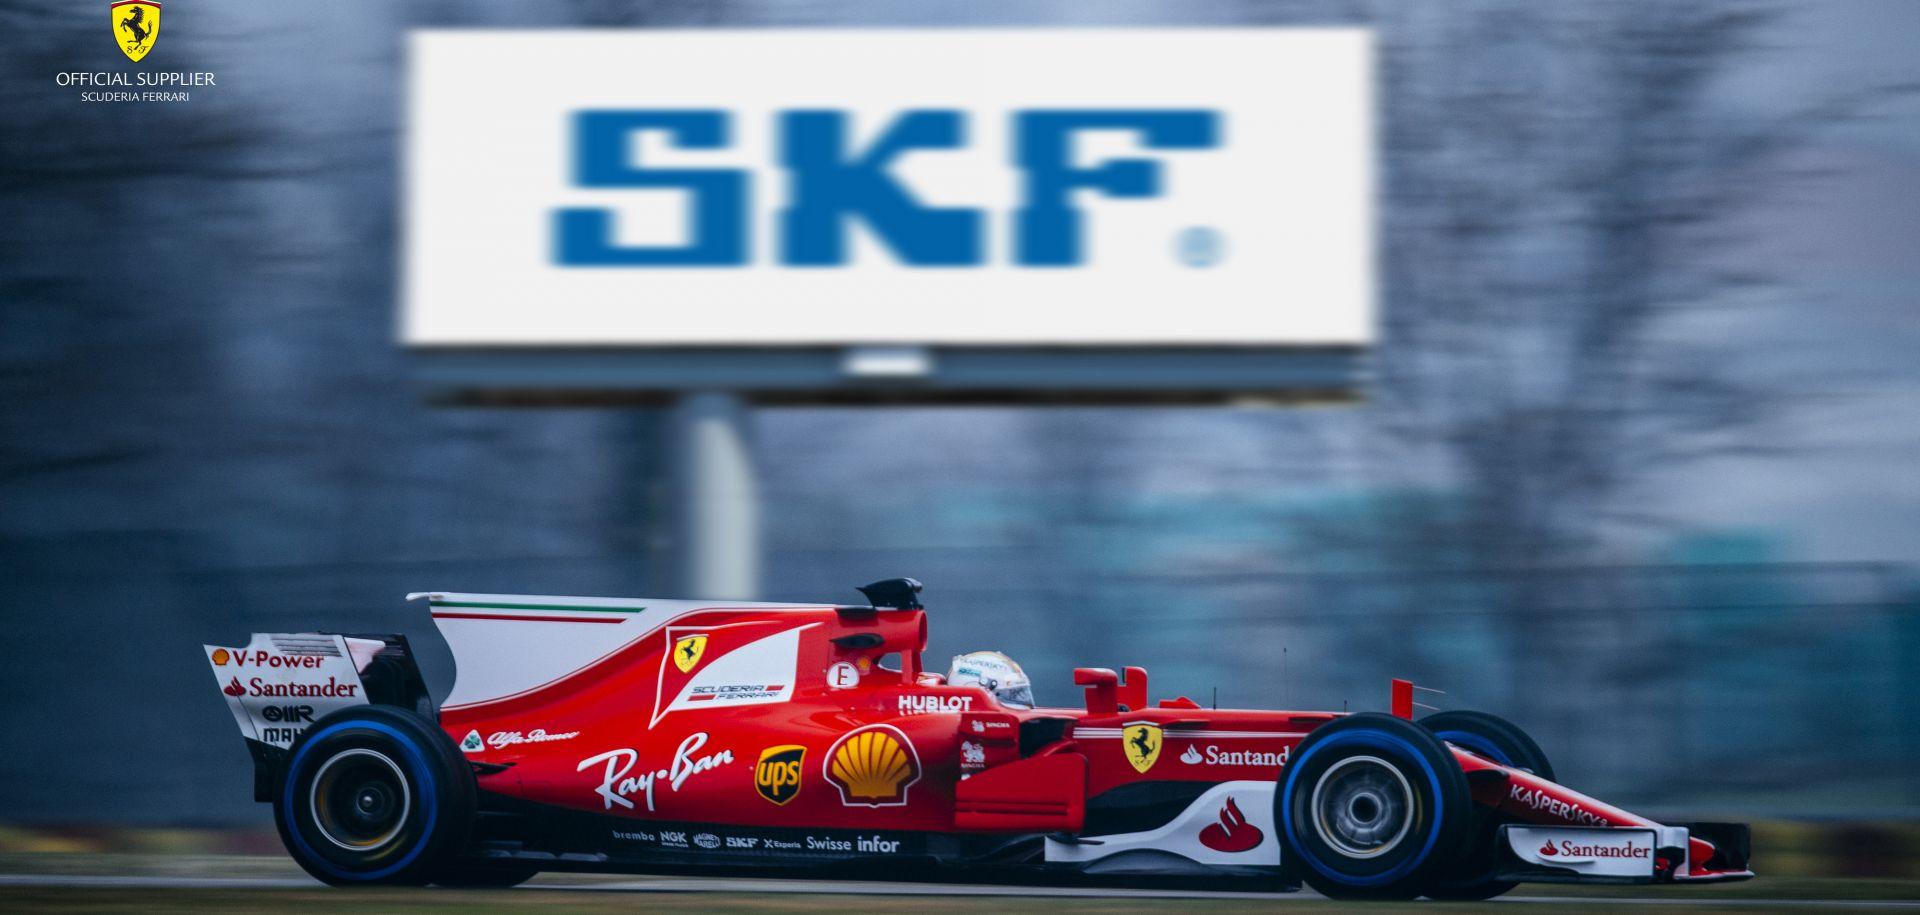 1_Ferrari_SKF_F1-season-start-2017